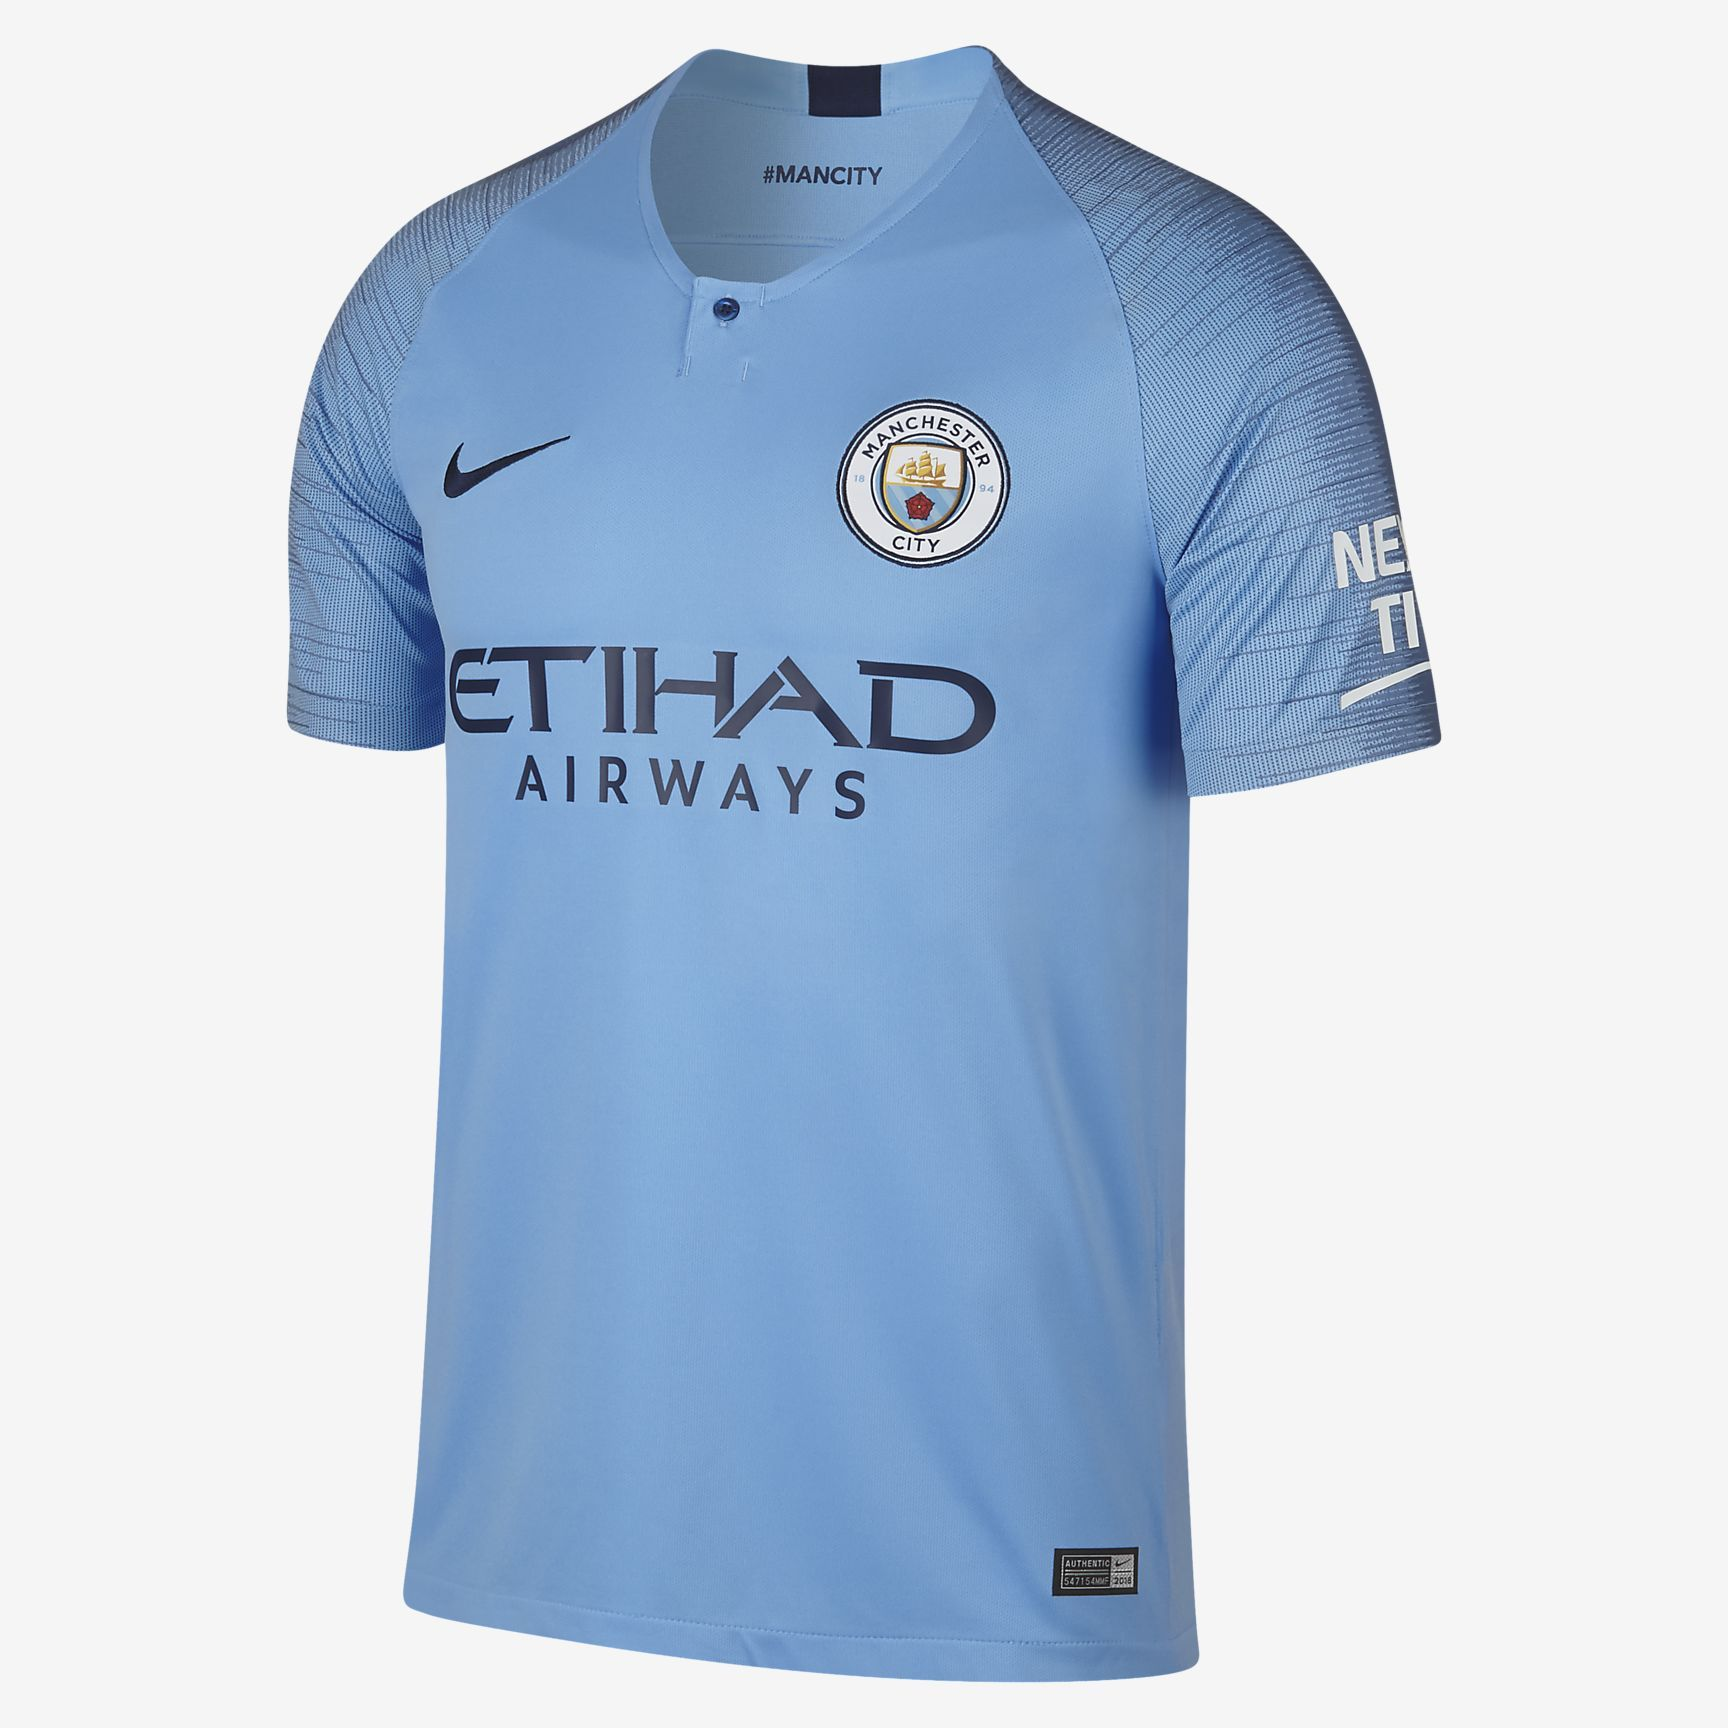 1e14f452723 2018/19 Manchester City FC Stadium Home Men's Football Shirt ...